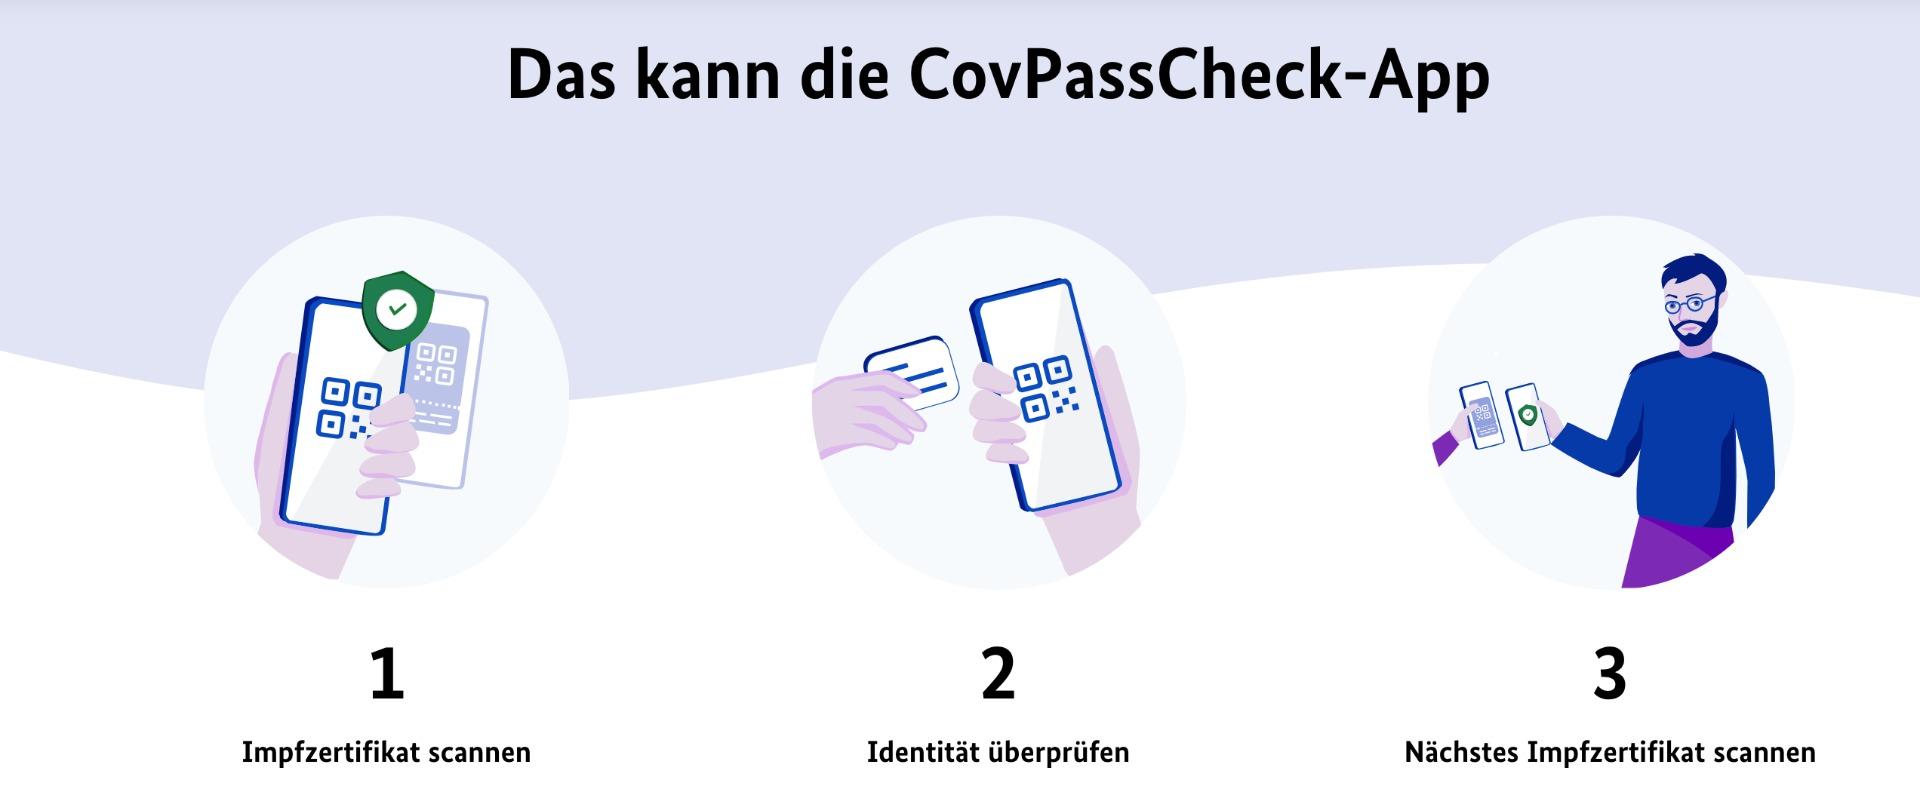 CovPass-Check-App